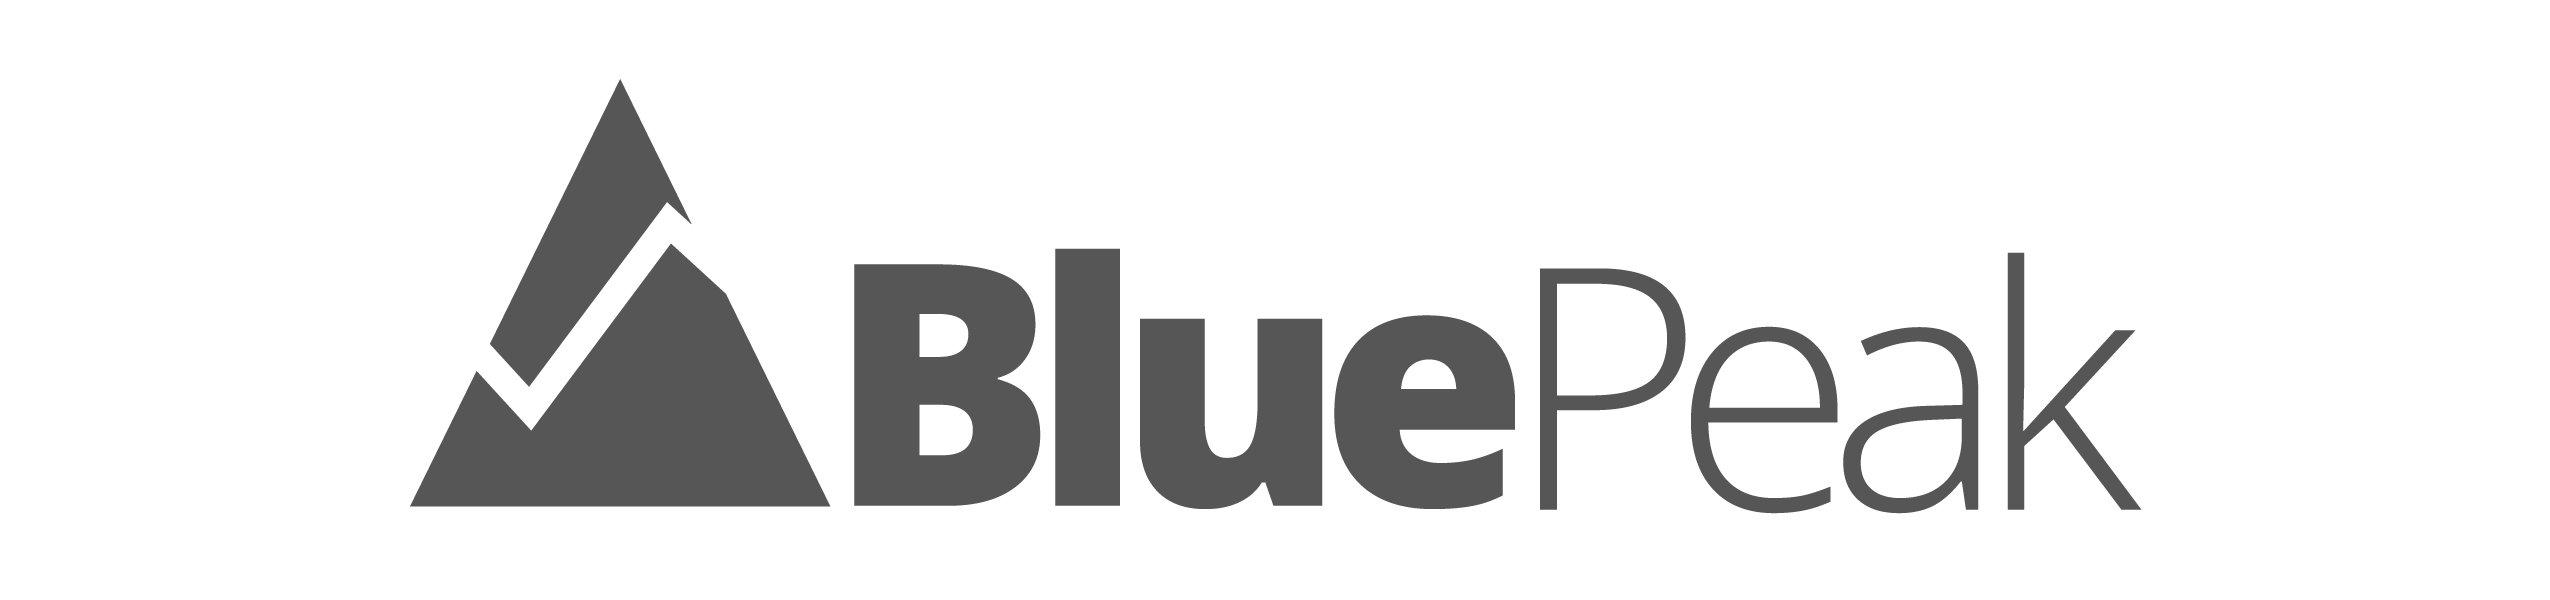 BluePeak Nespresso Coffee Capsule Rack Holder Carousel - Holds 50 Capsules OriginalLine. Elegant and Modern Chrome Finish. 360-degree Rotation. For Citiz, Pixie & Latissima Machines by BluePeak (Image #9)